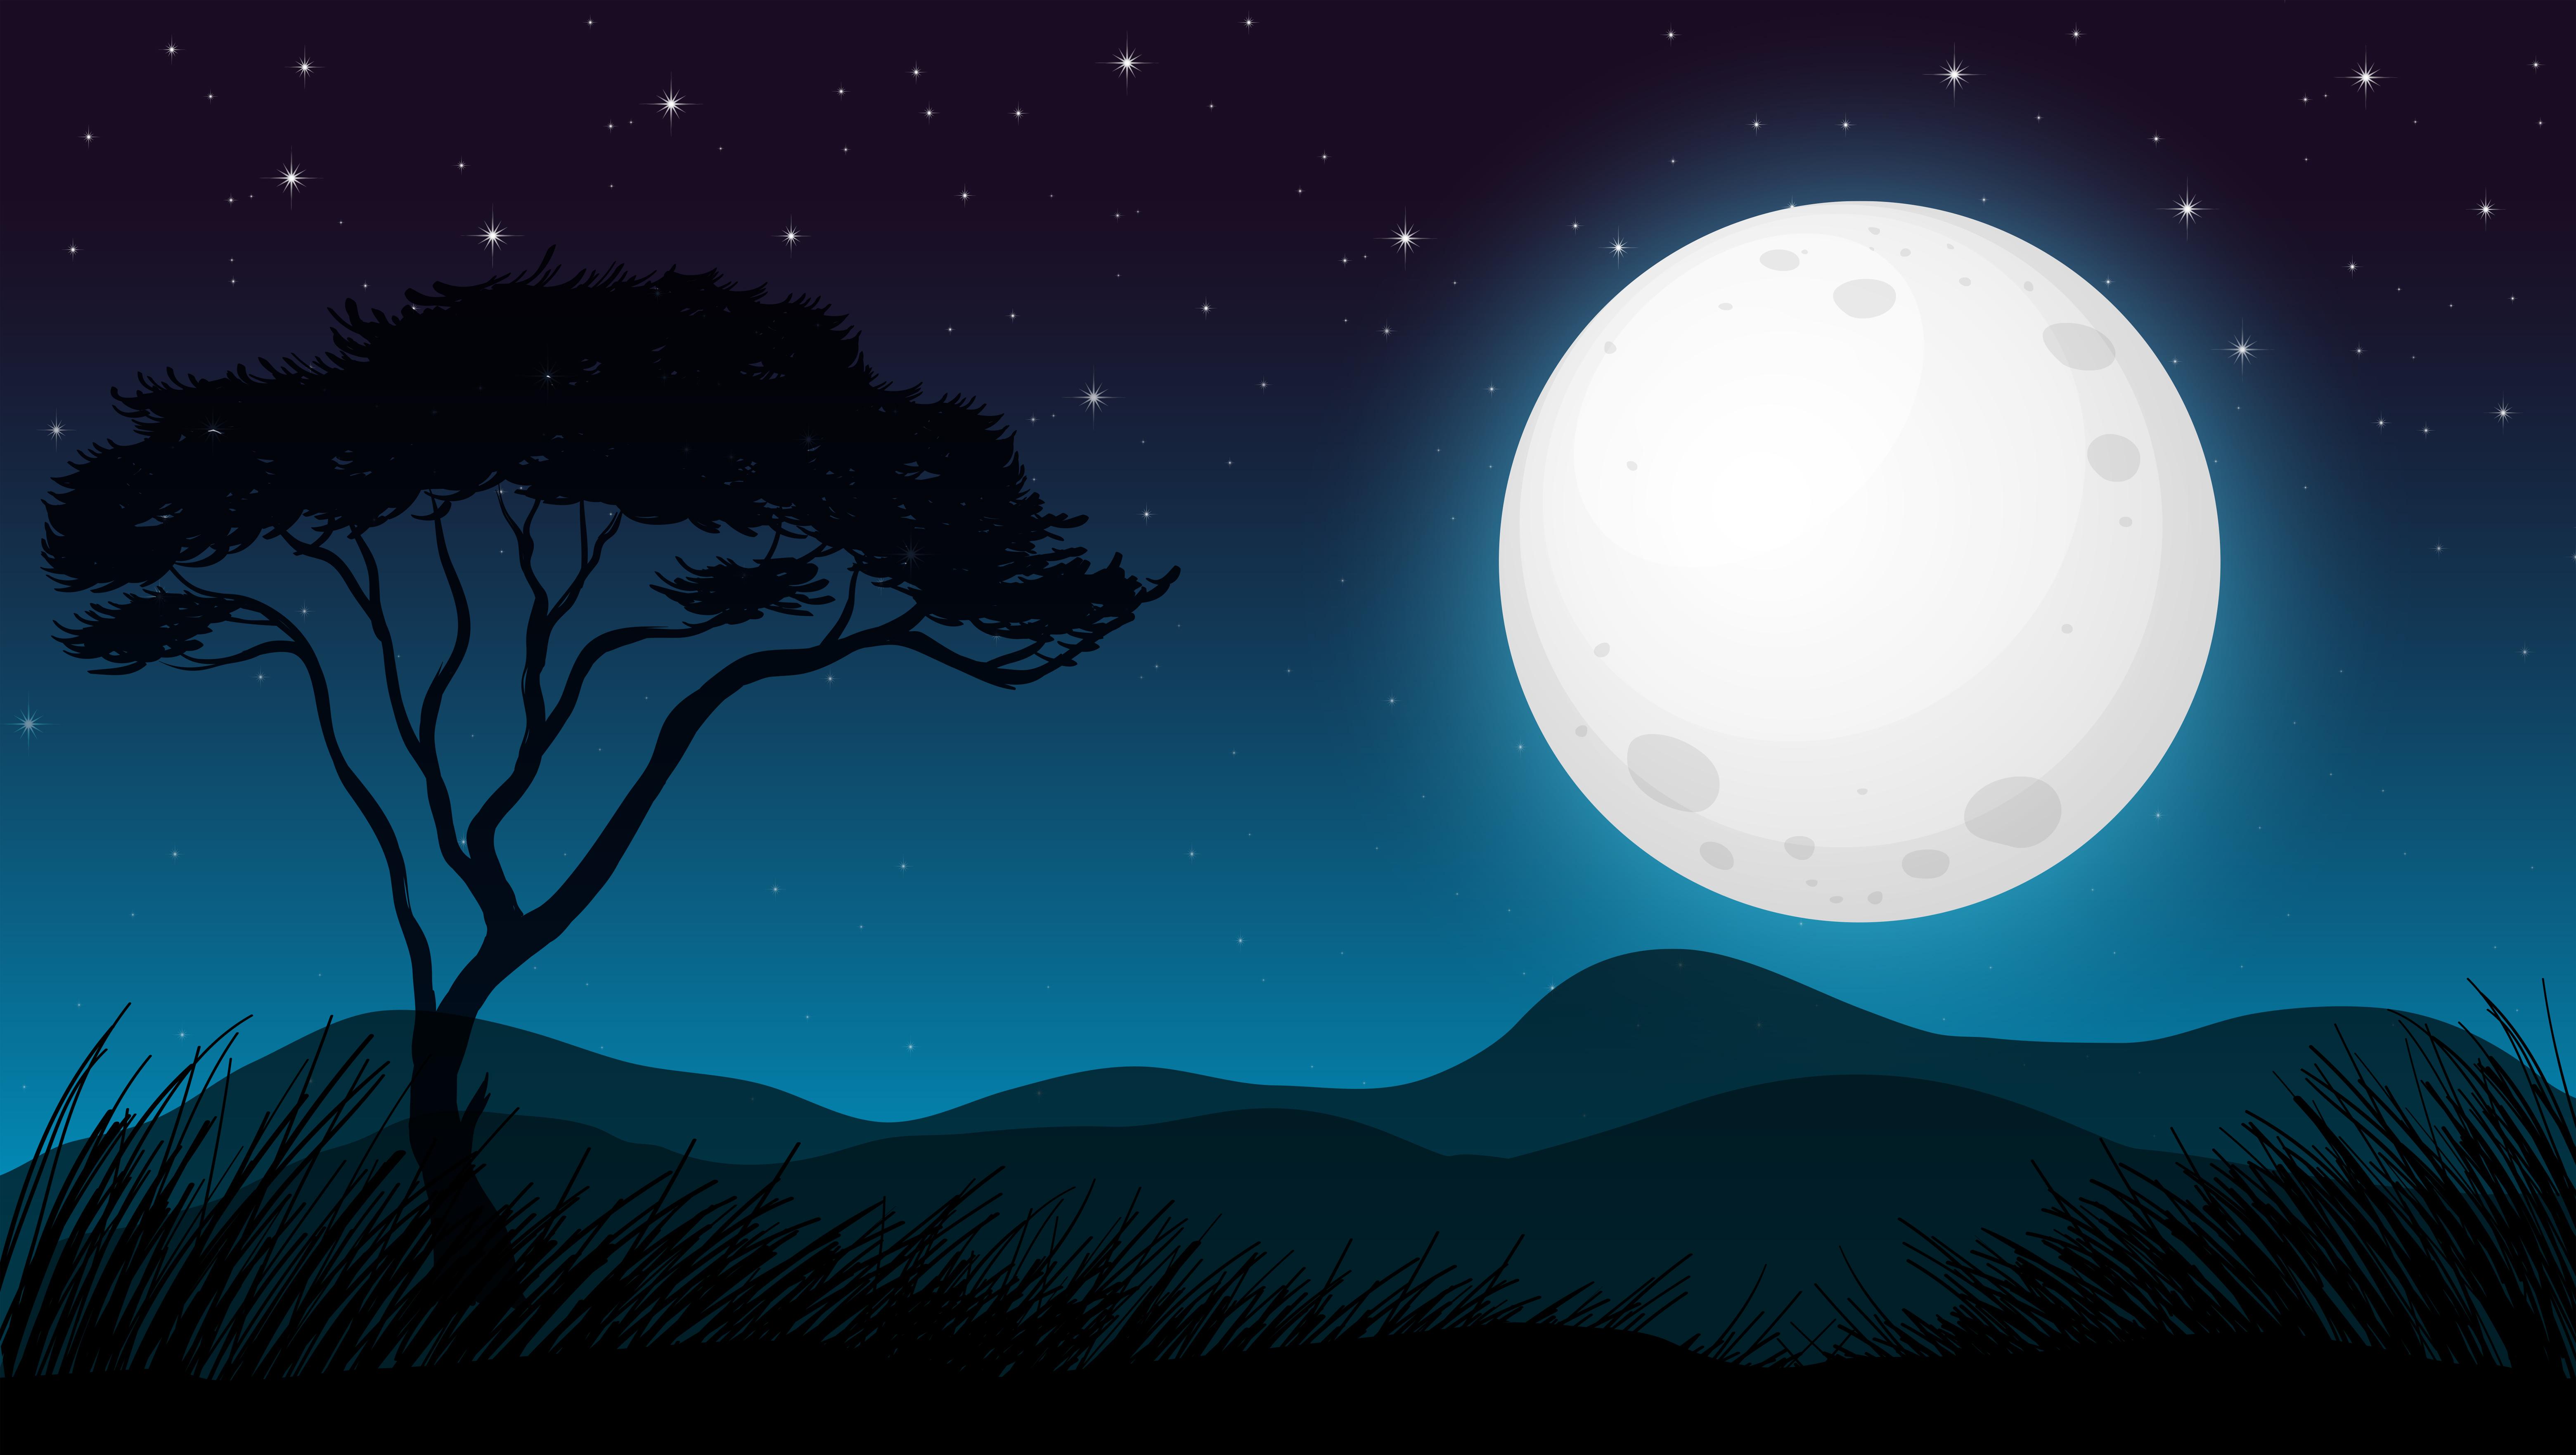 Cute Baby Wallpaper Backgrounds Savanna Forest In Dark Night Download Free Vector Art